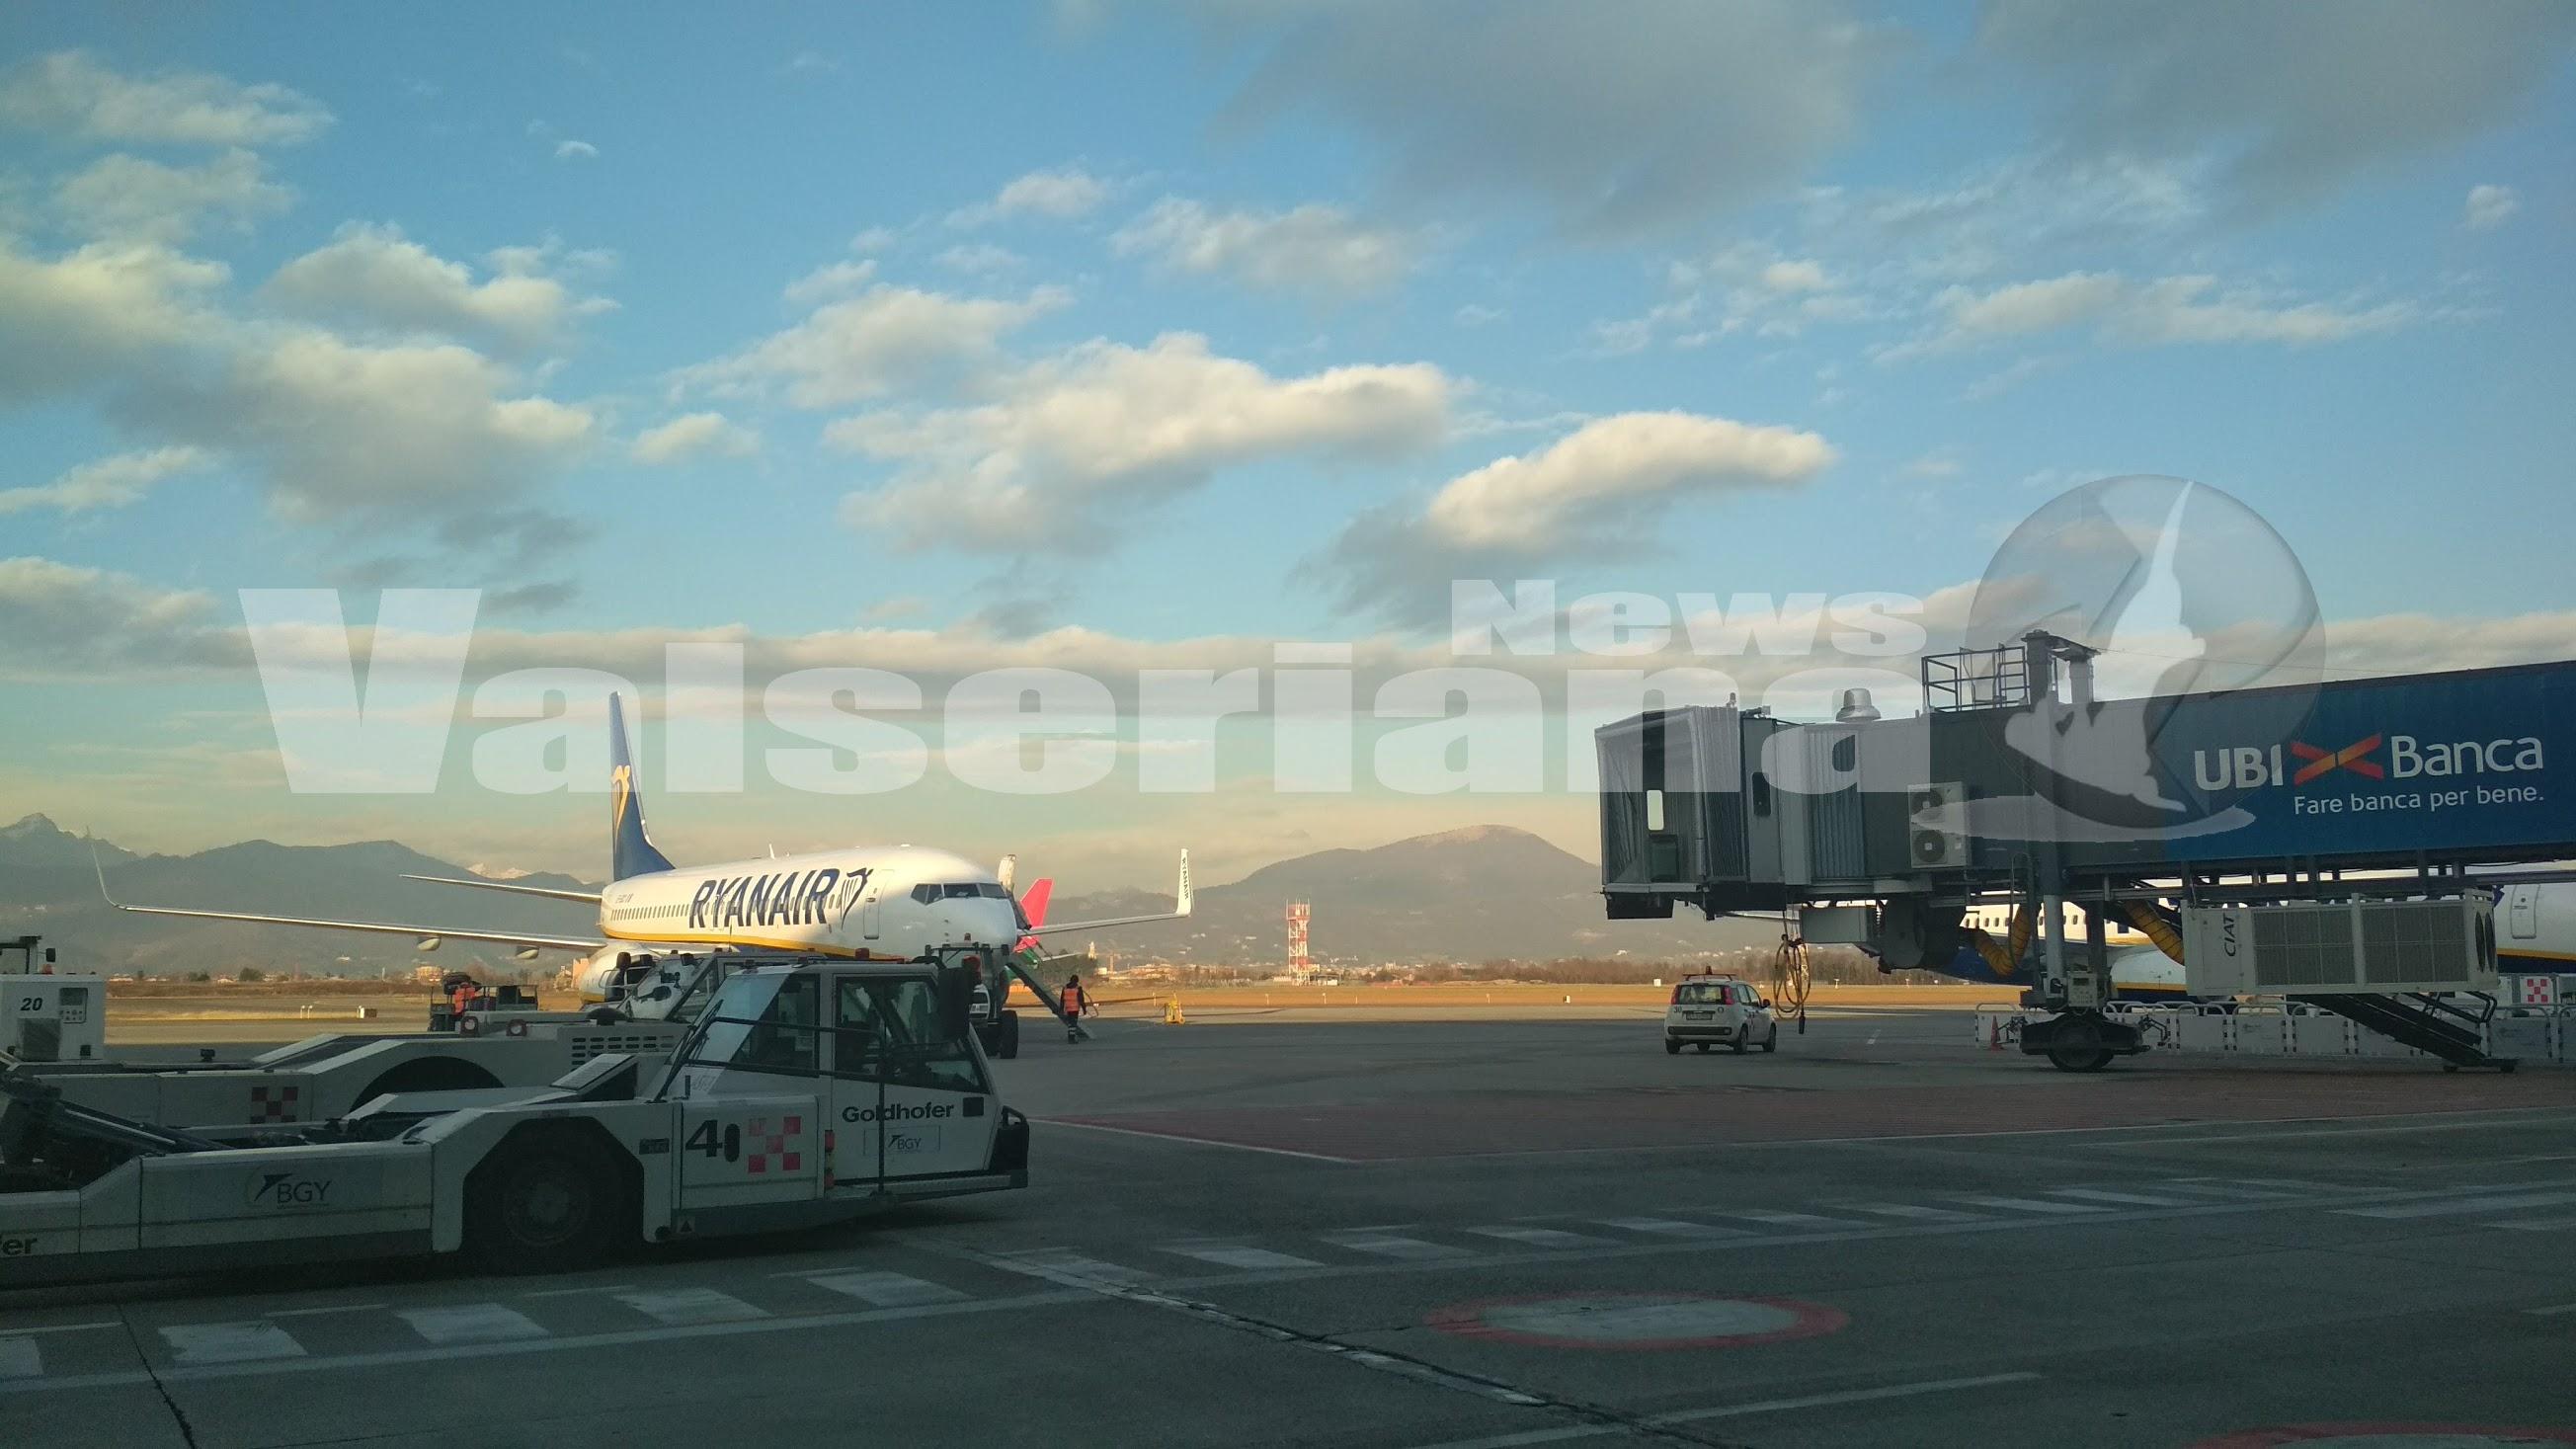 modellismo aeroporto bergamo - photo#9